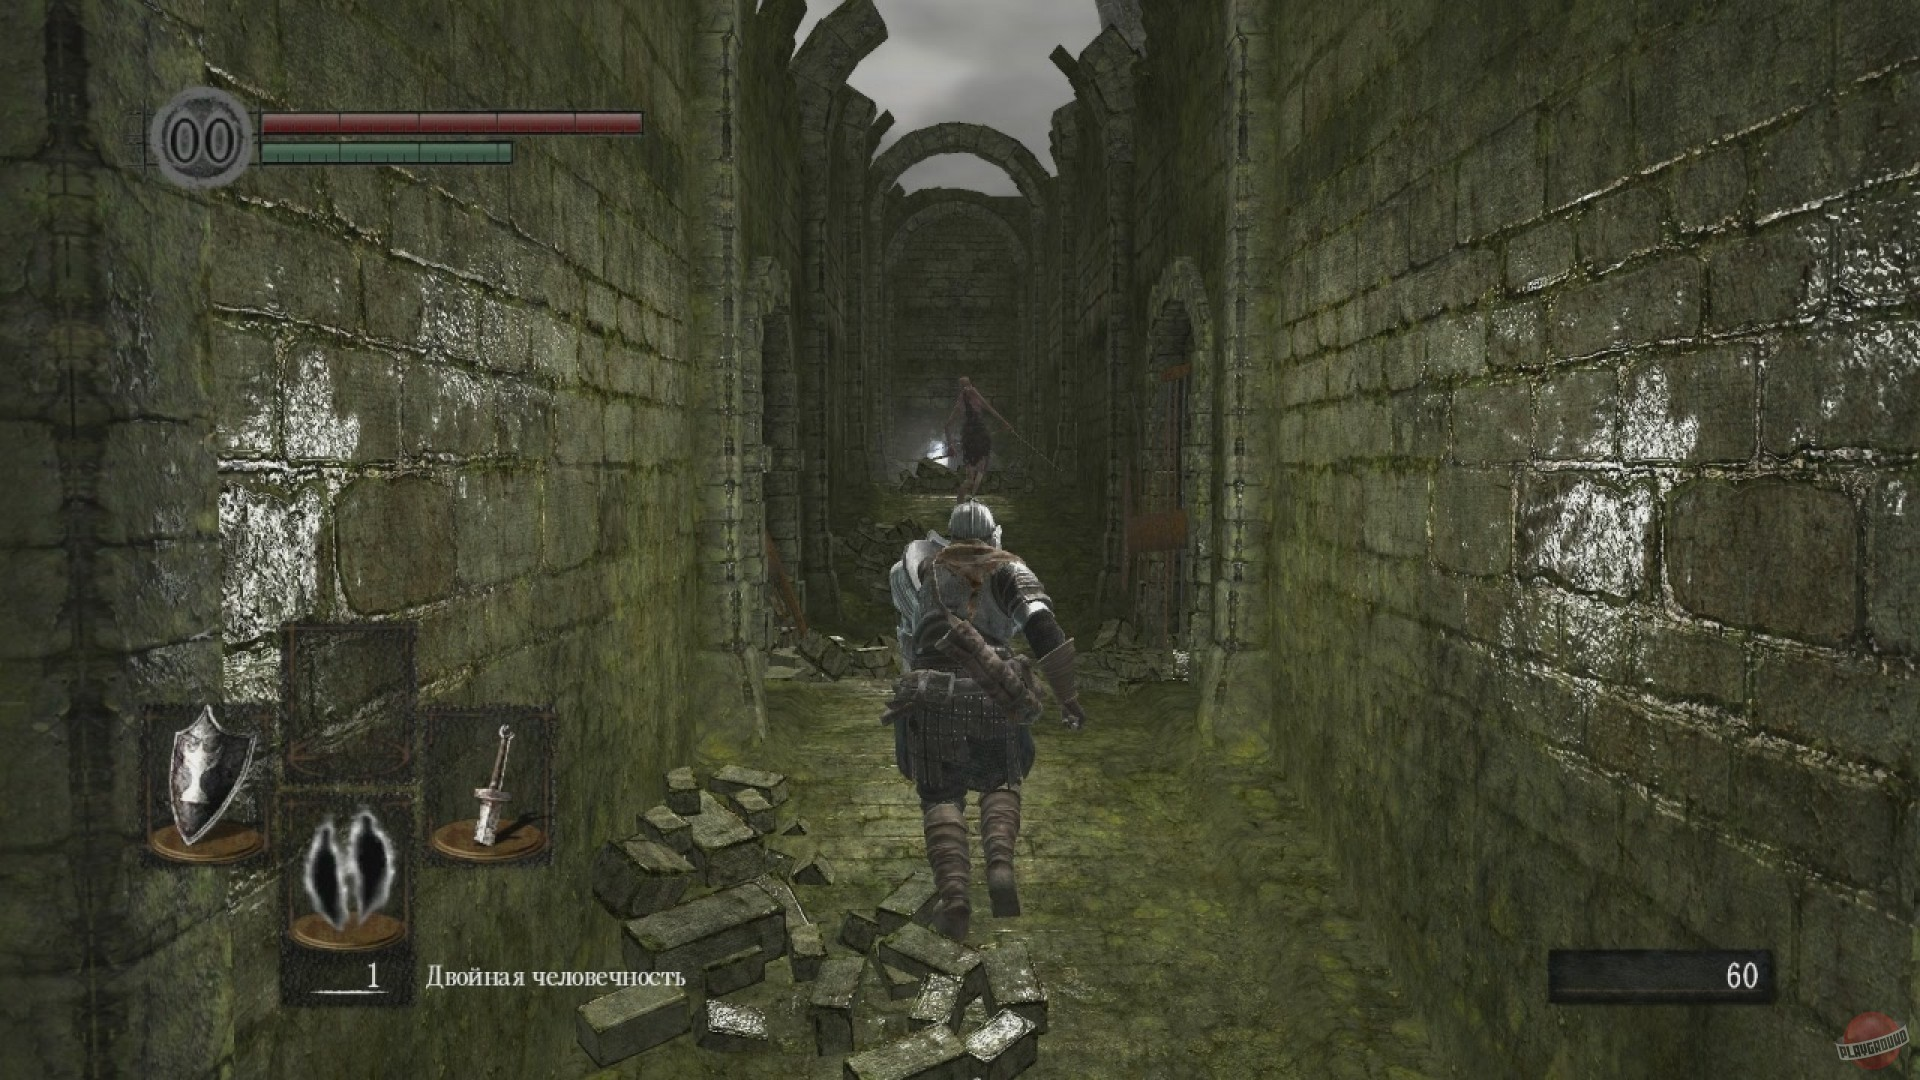 Скриншоты Dark Souls - галерея, снимки экрана, скриншоты